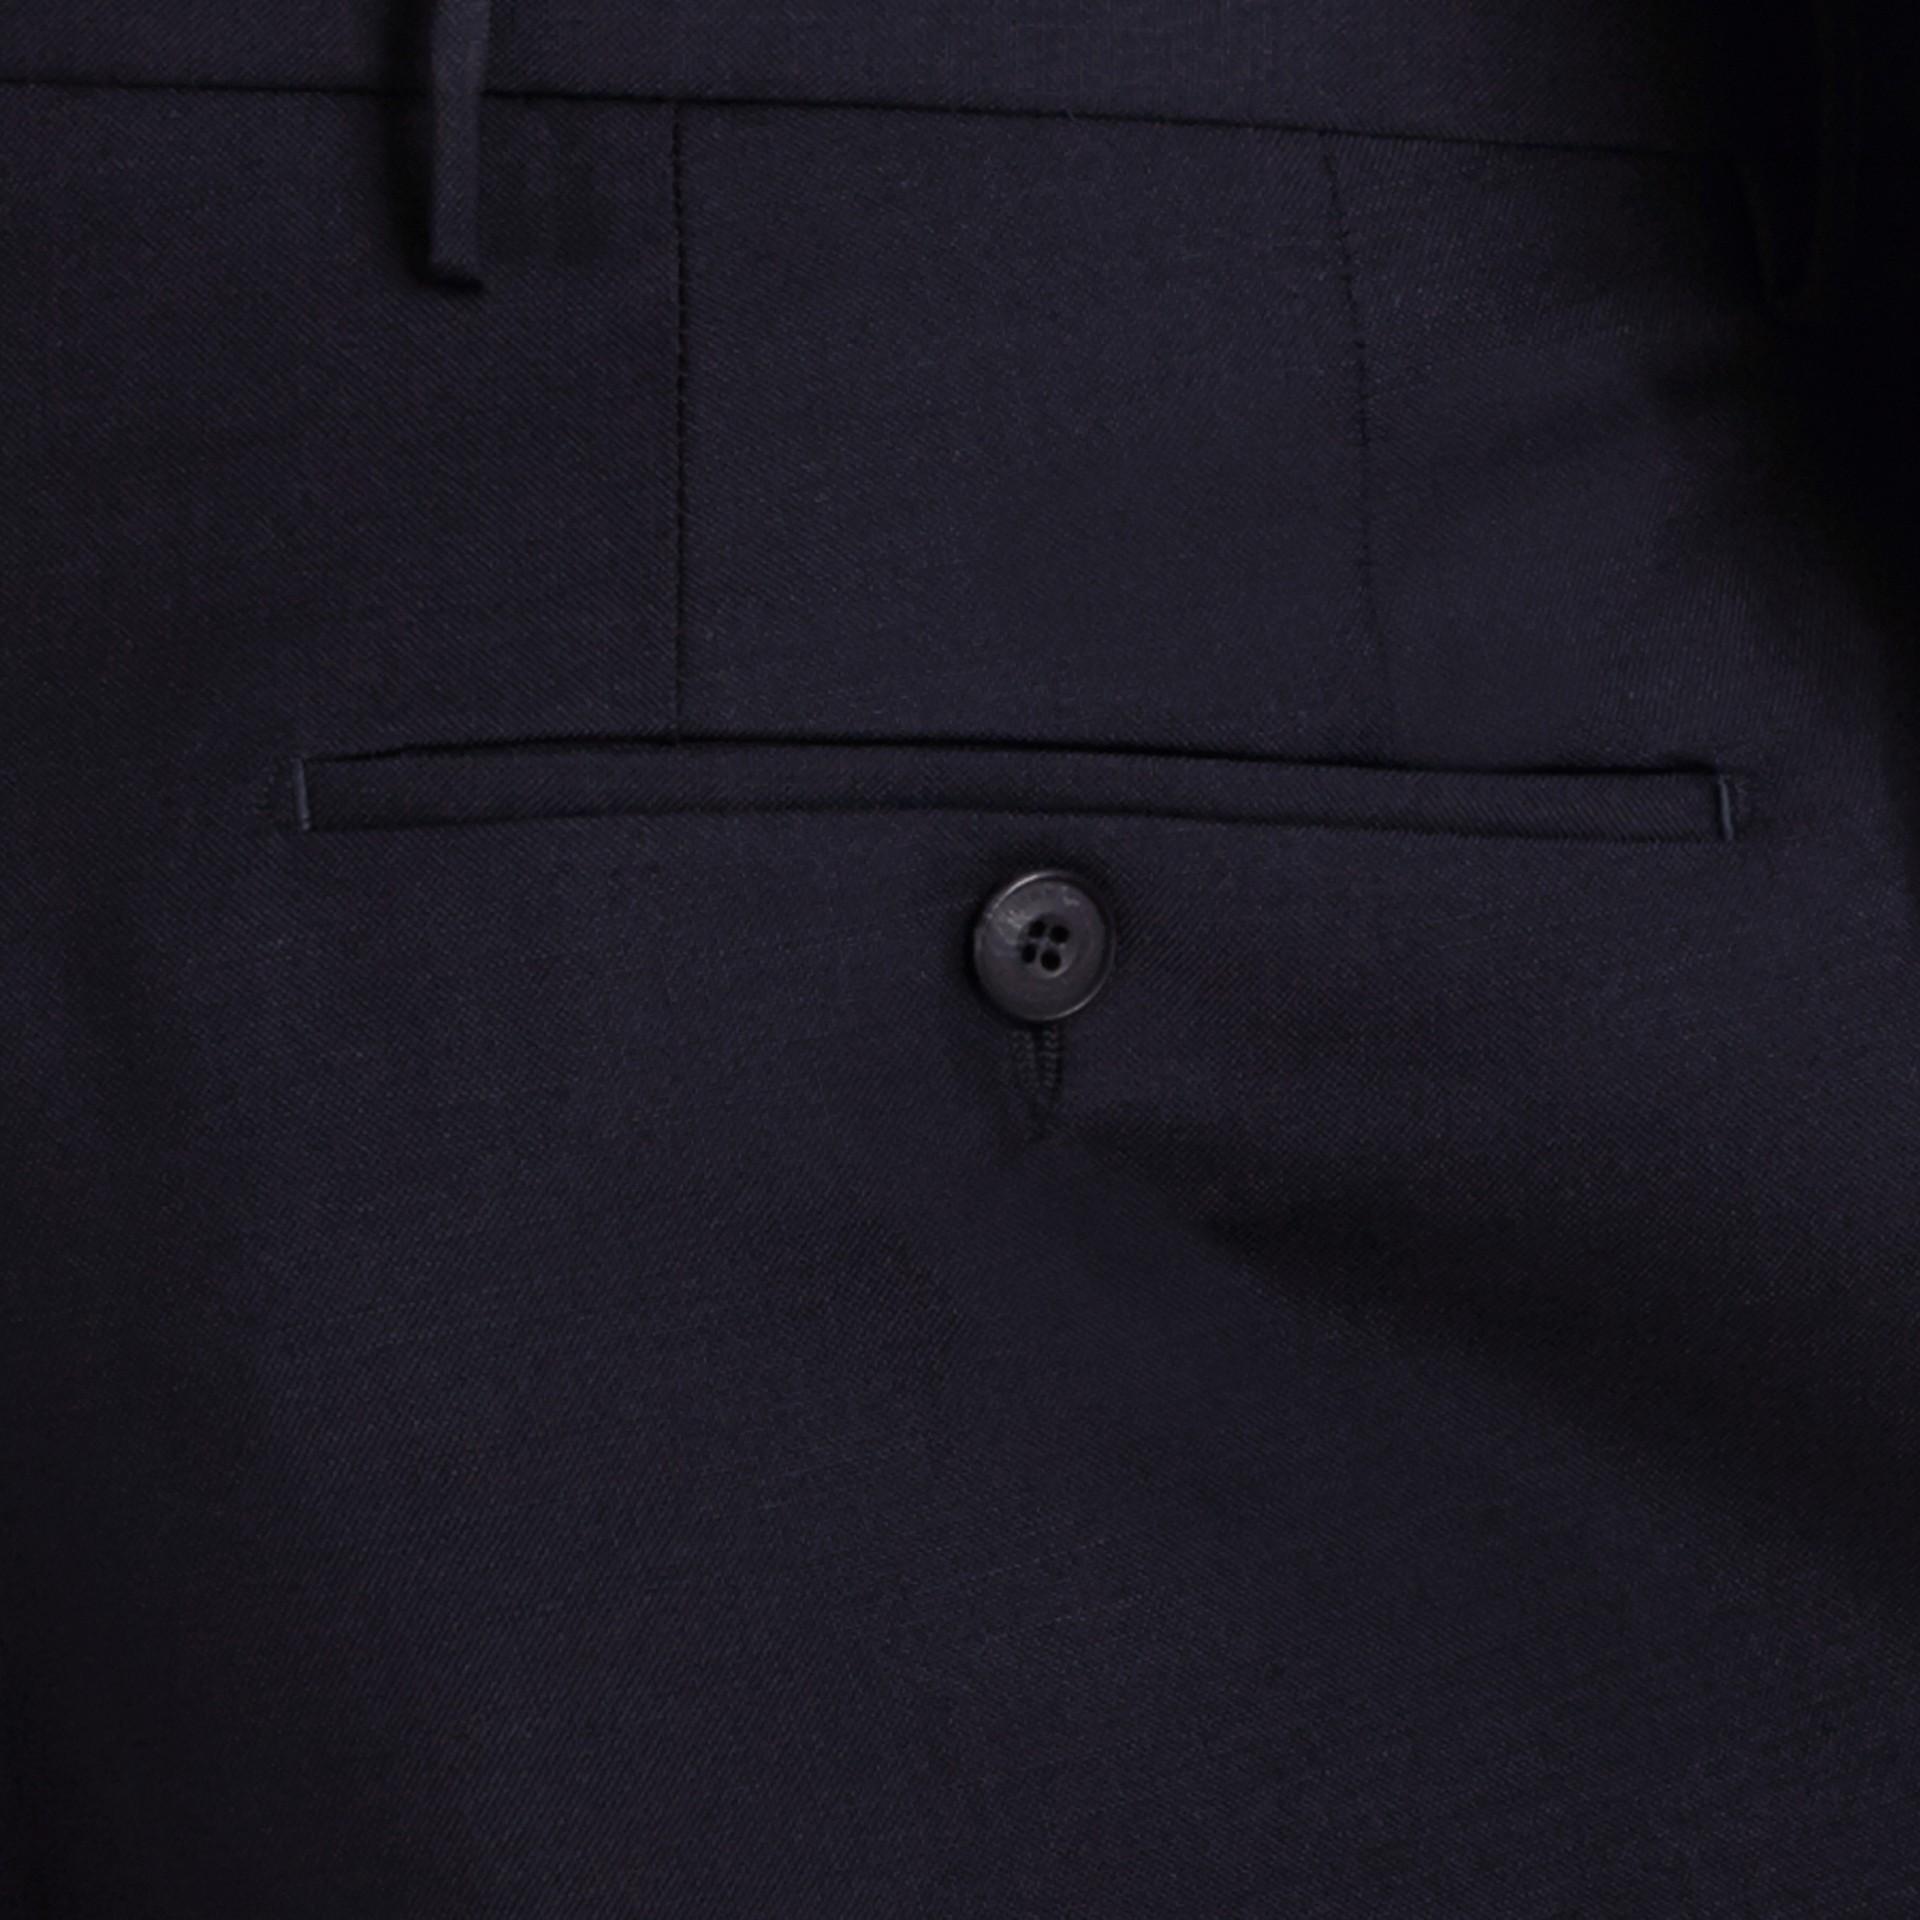 Marine véritable Pantalon de coupe moderne en laine et mohair Marine Véritable - photo de la galerie 2